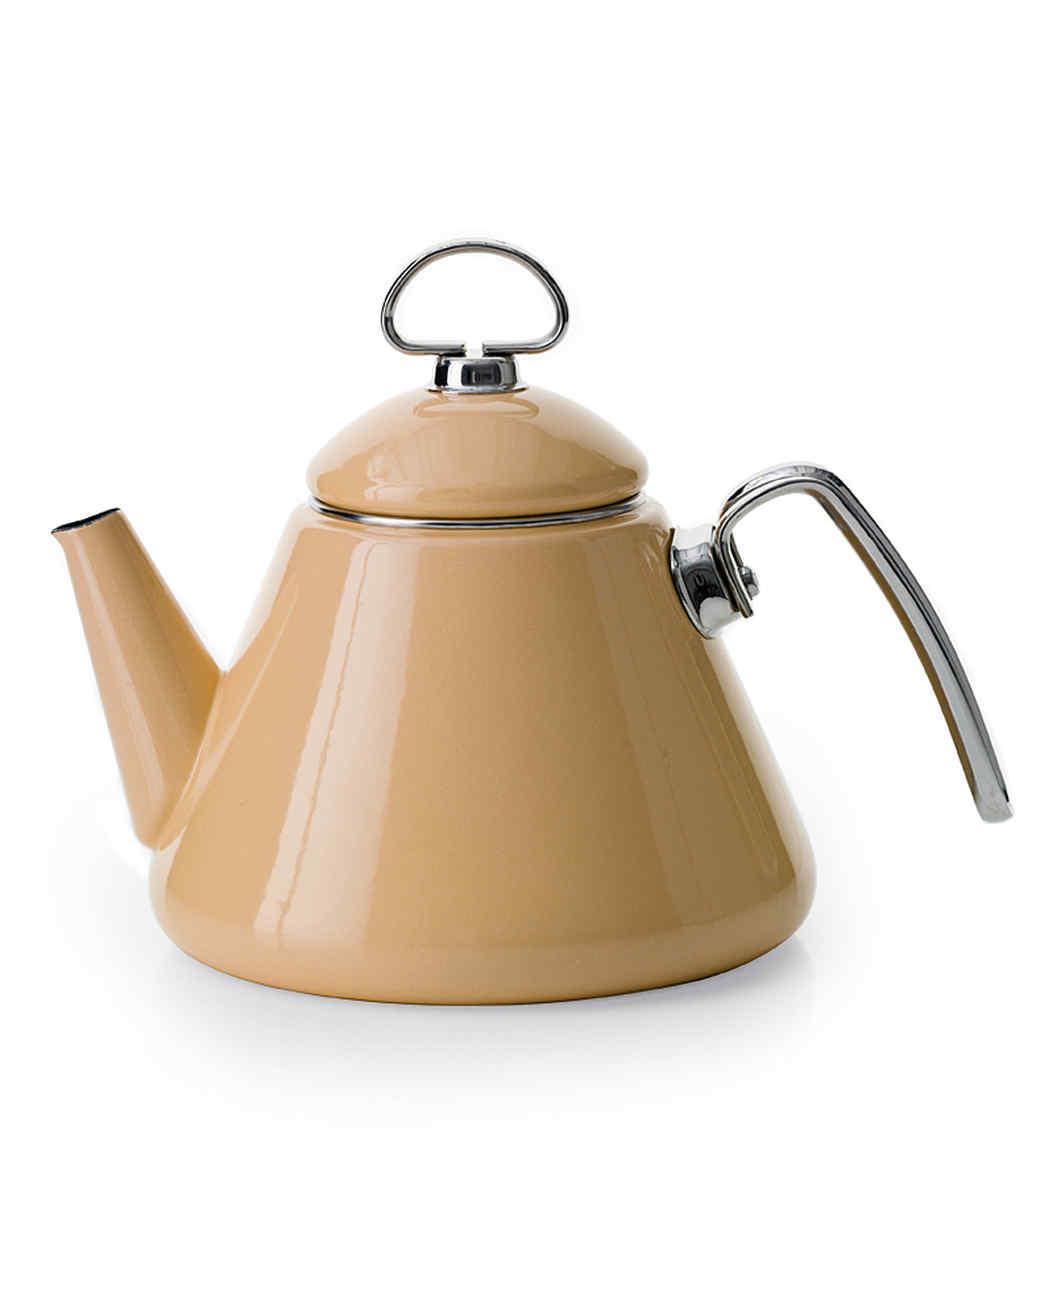 mld103940_0309_teapots.jpg